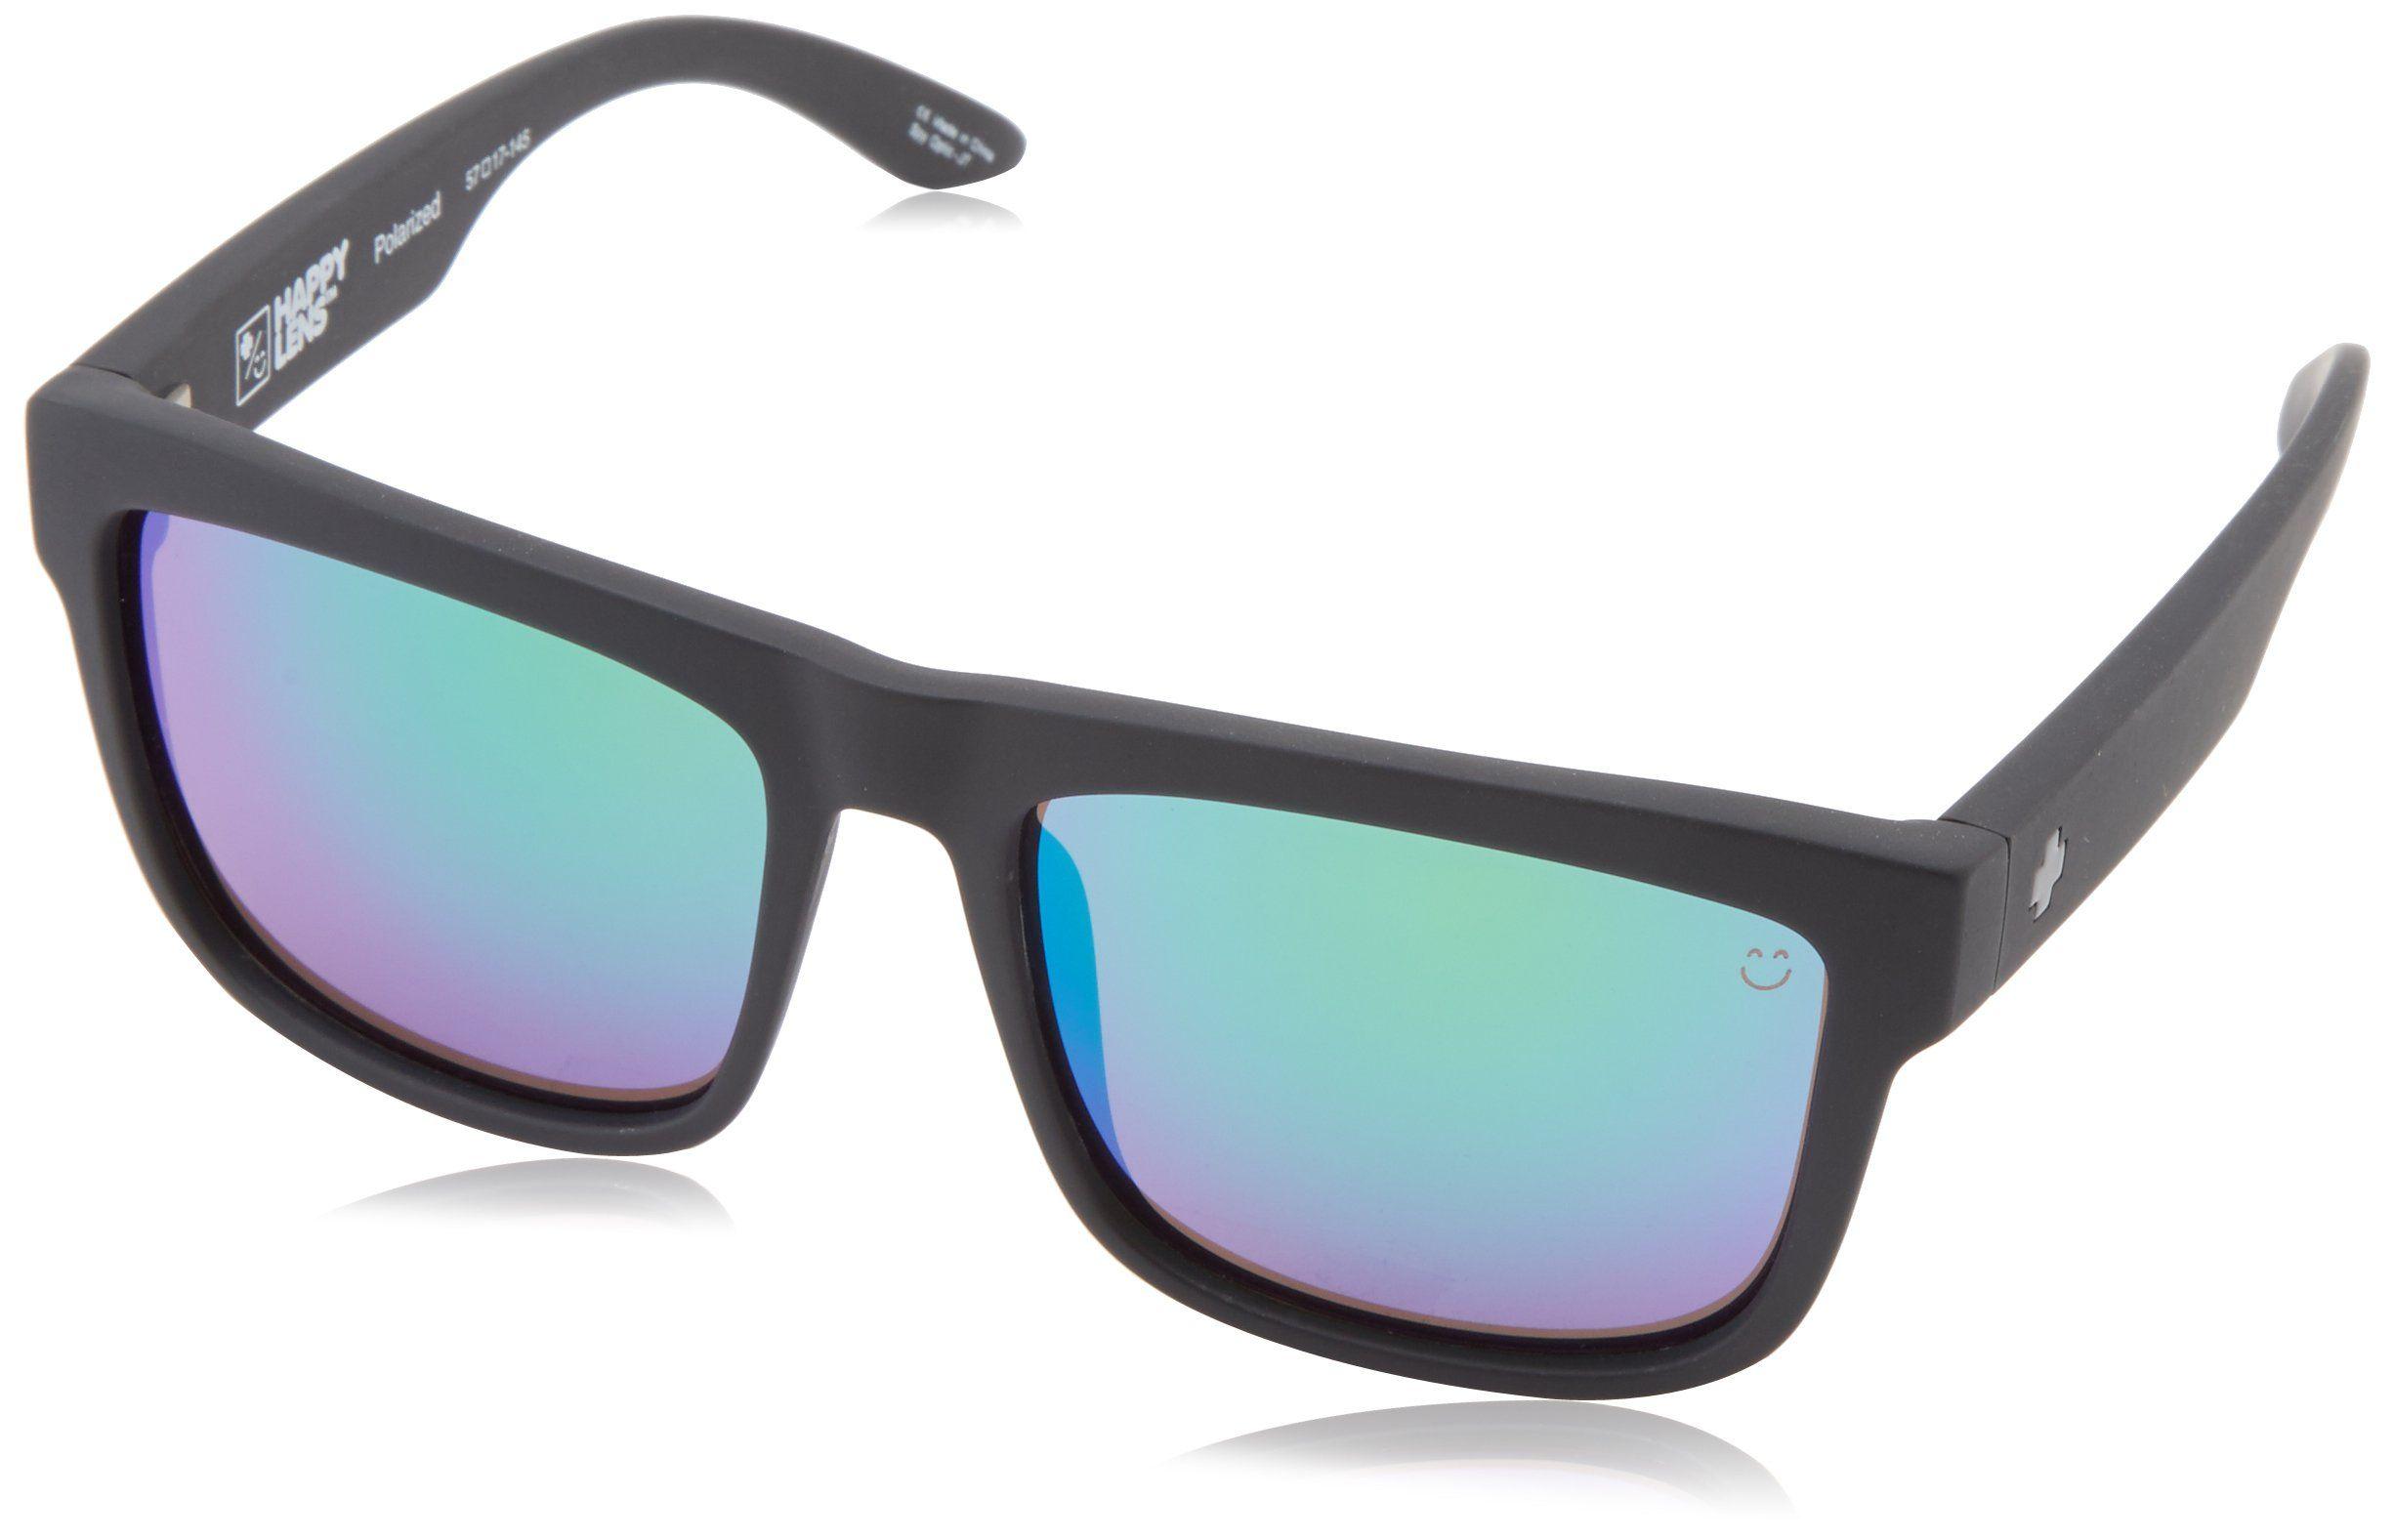 5c1052a0f98 Spy Optic Discord Polarized Flat Sunglasses